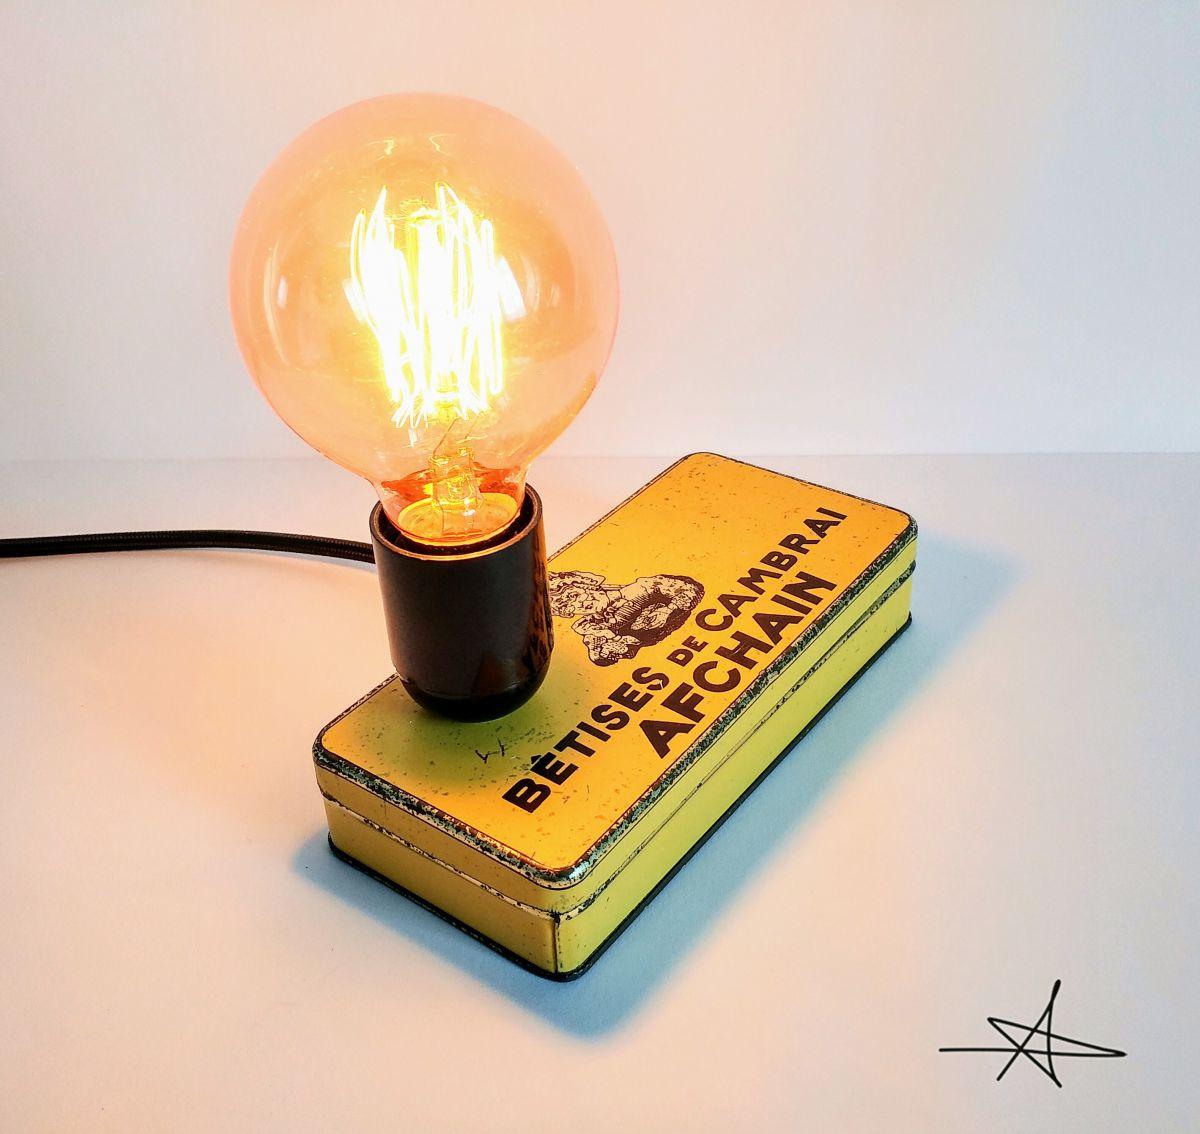 lampe vintage lampe d 39 ambiance lampe de chevet les b tises luckyfind. Black Bedroom Furniture Sets. Home Design Ideas